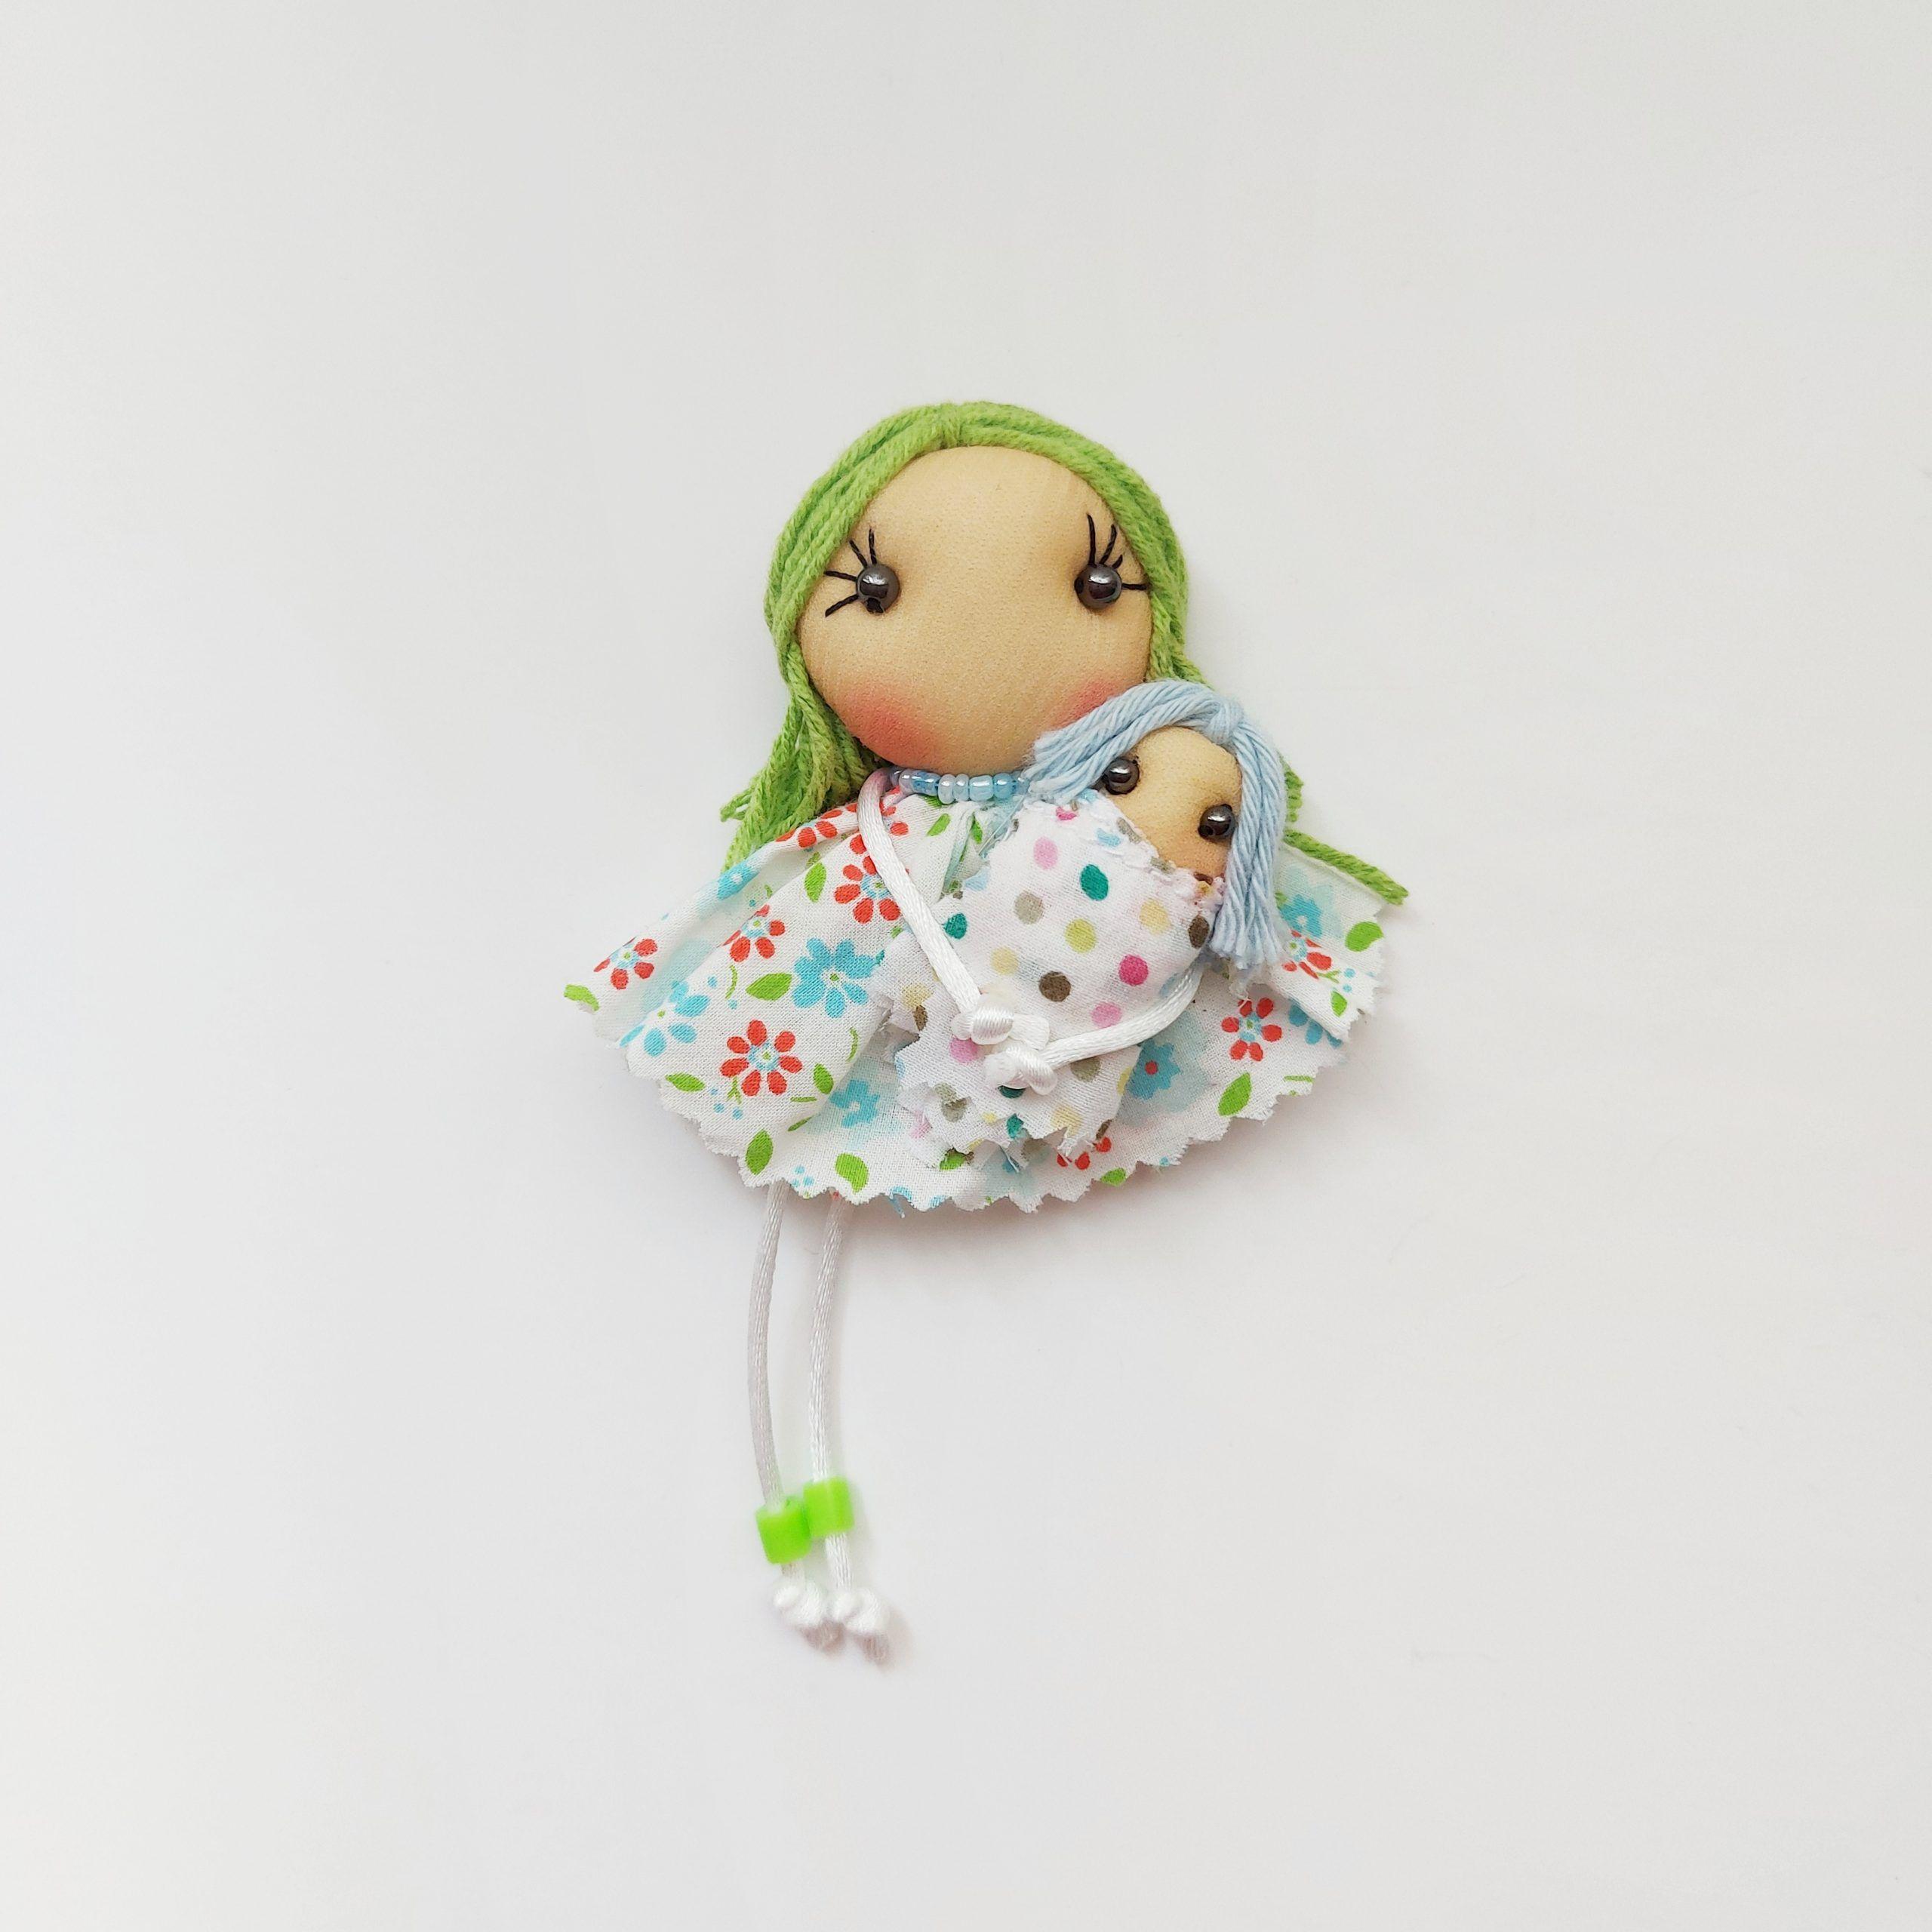 Broche muñeca con bebé